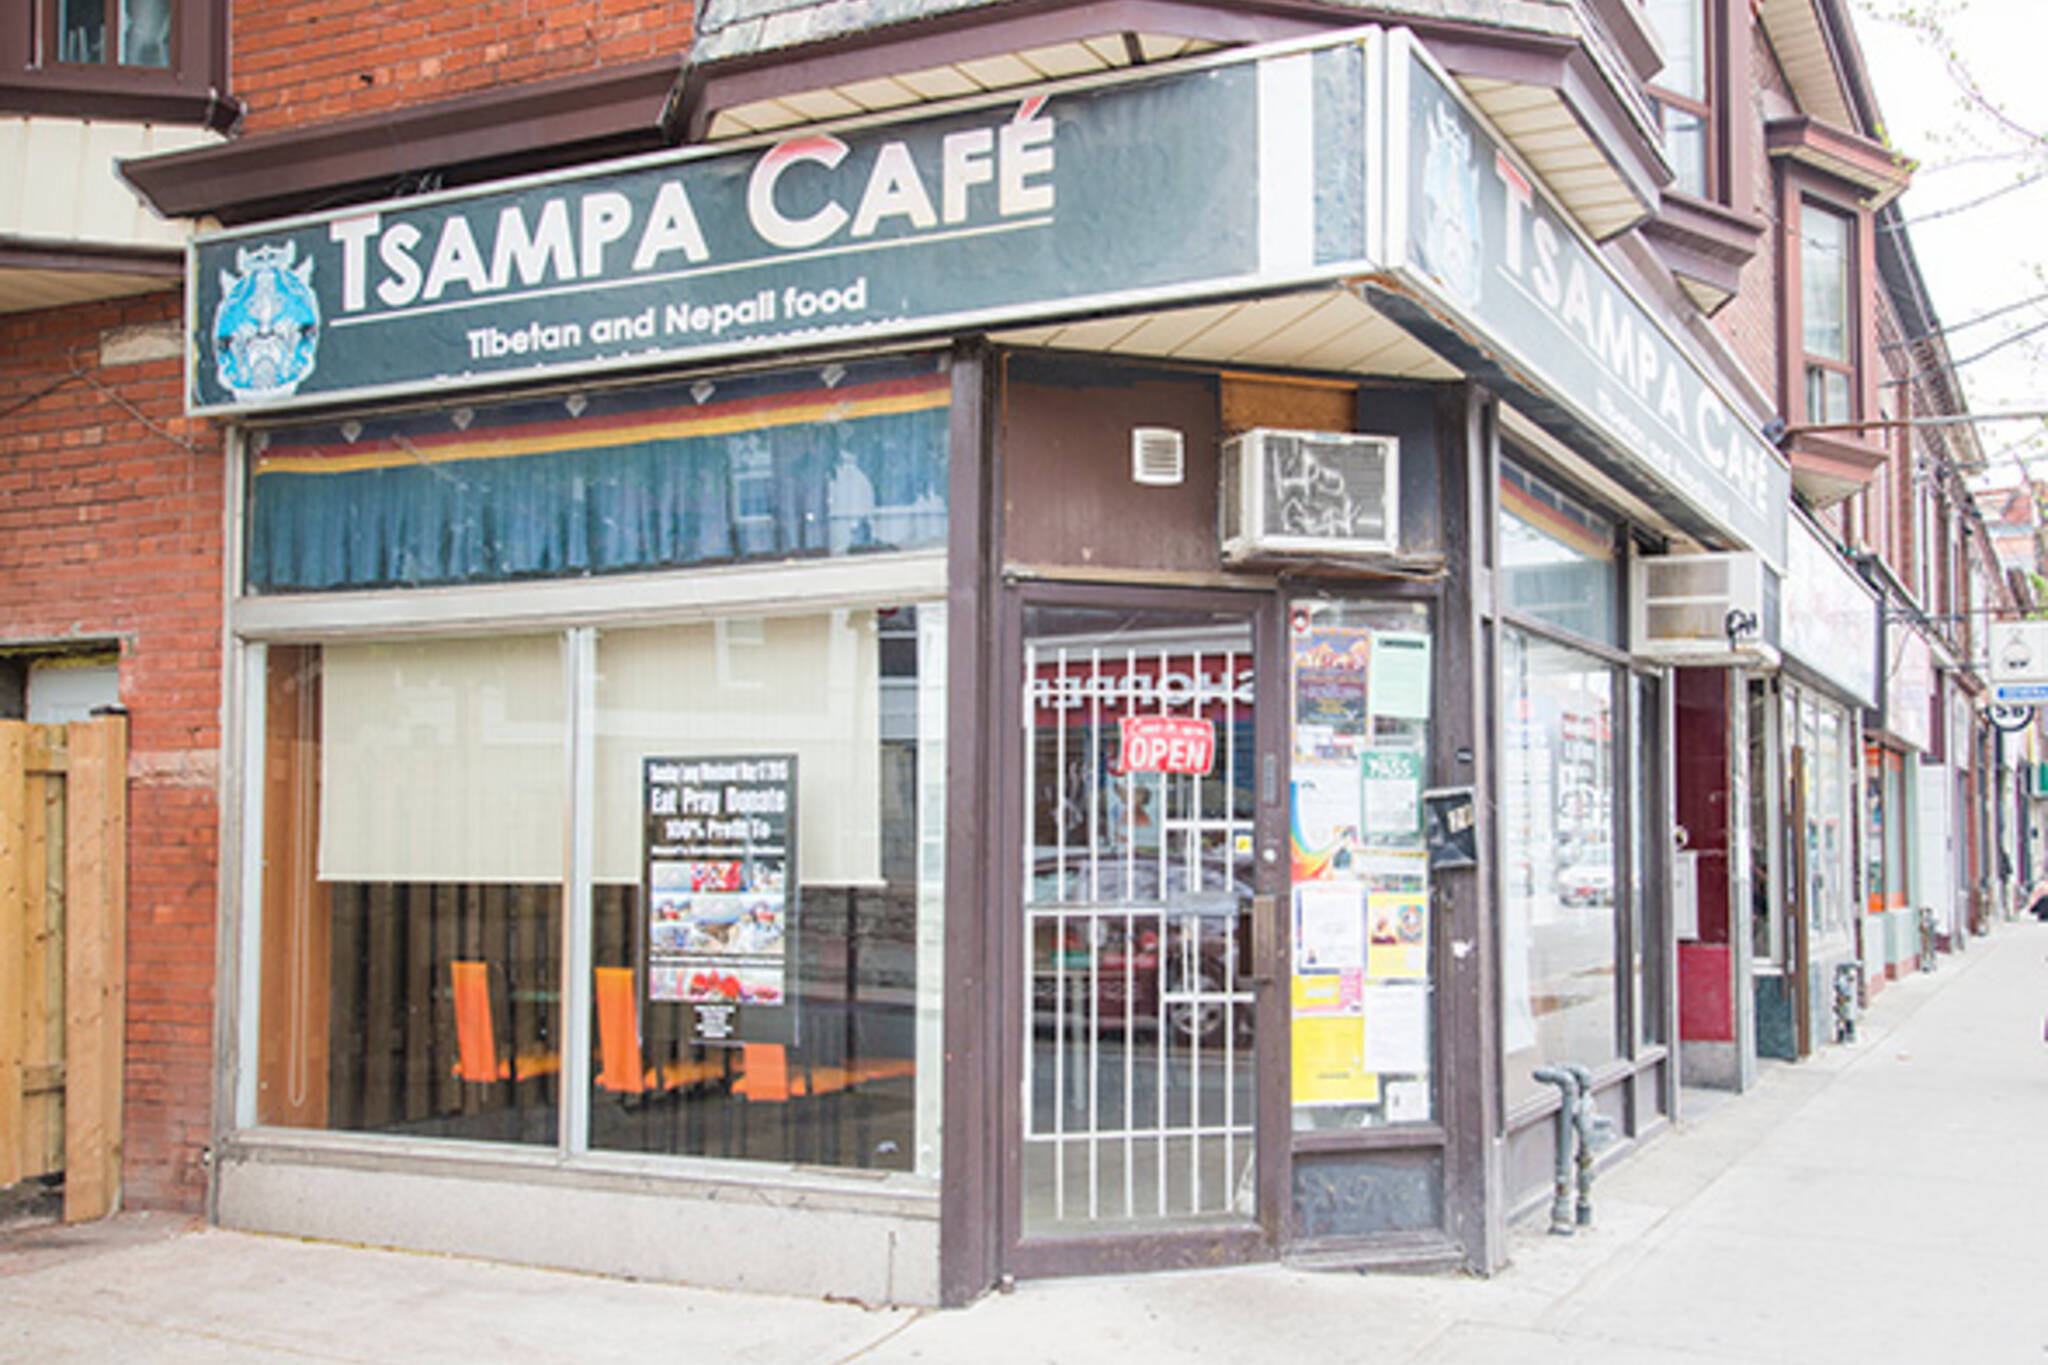 Tsampa Cafe Toronto